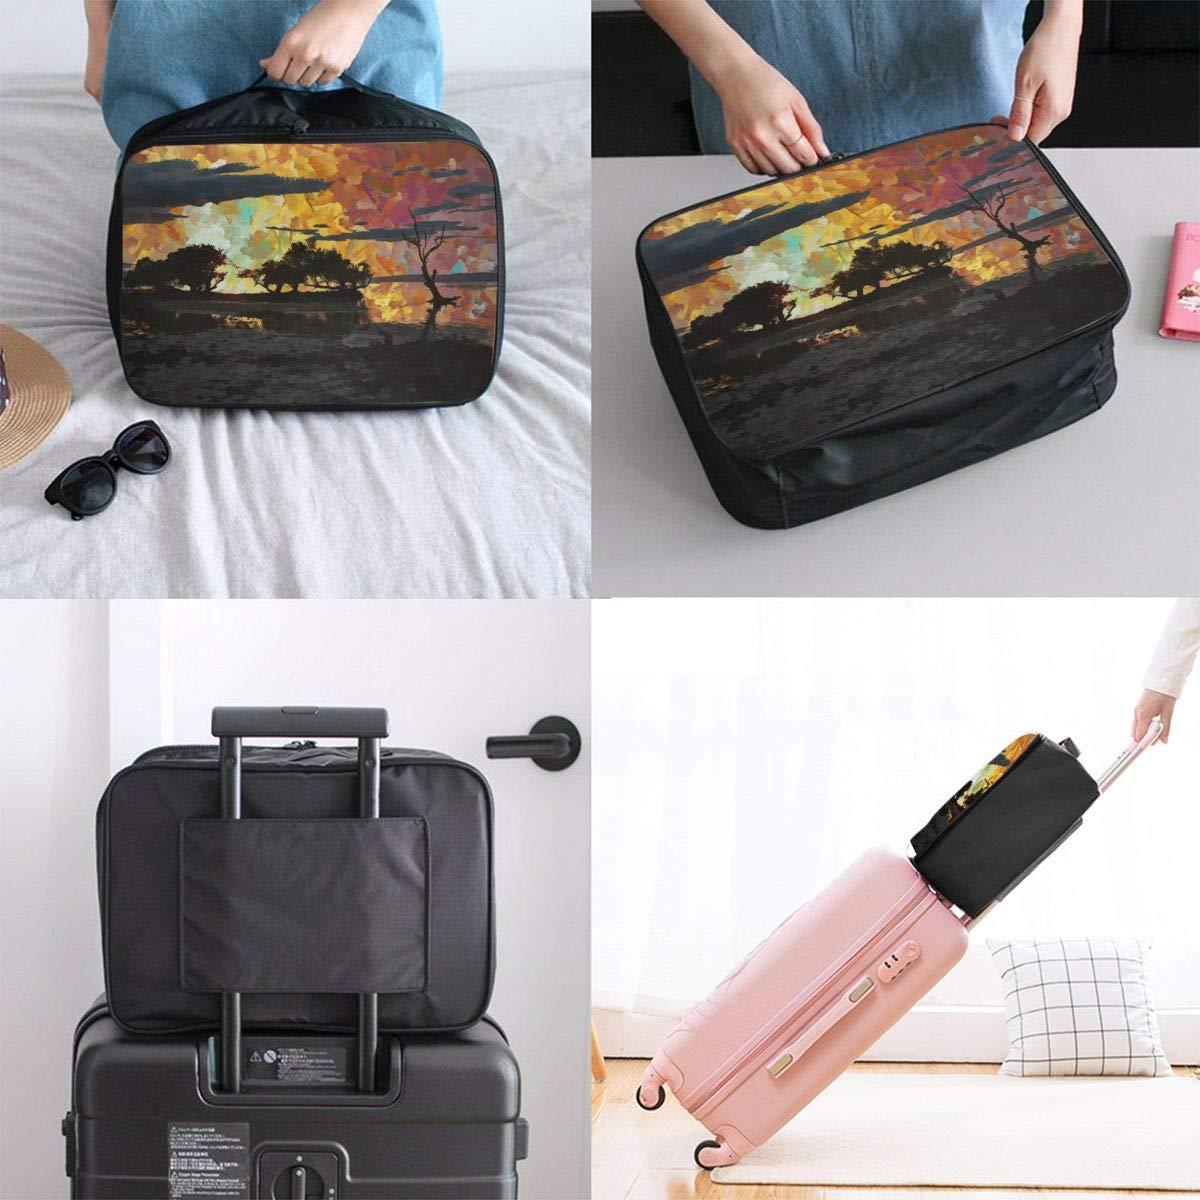 Sunset Tree Natural Dusk Art Painting Travel Lightweight Waterproof Foldable Storage Carry Luggage Large Capacity Portable Luggage Bag Duffel Bag